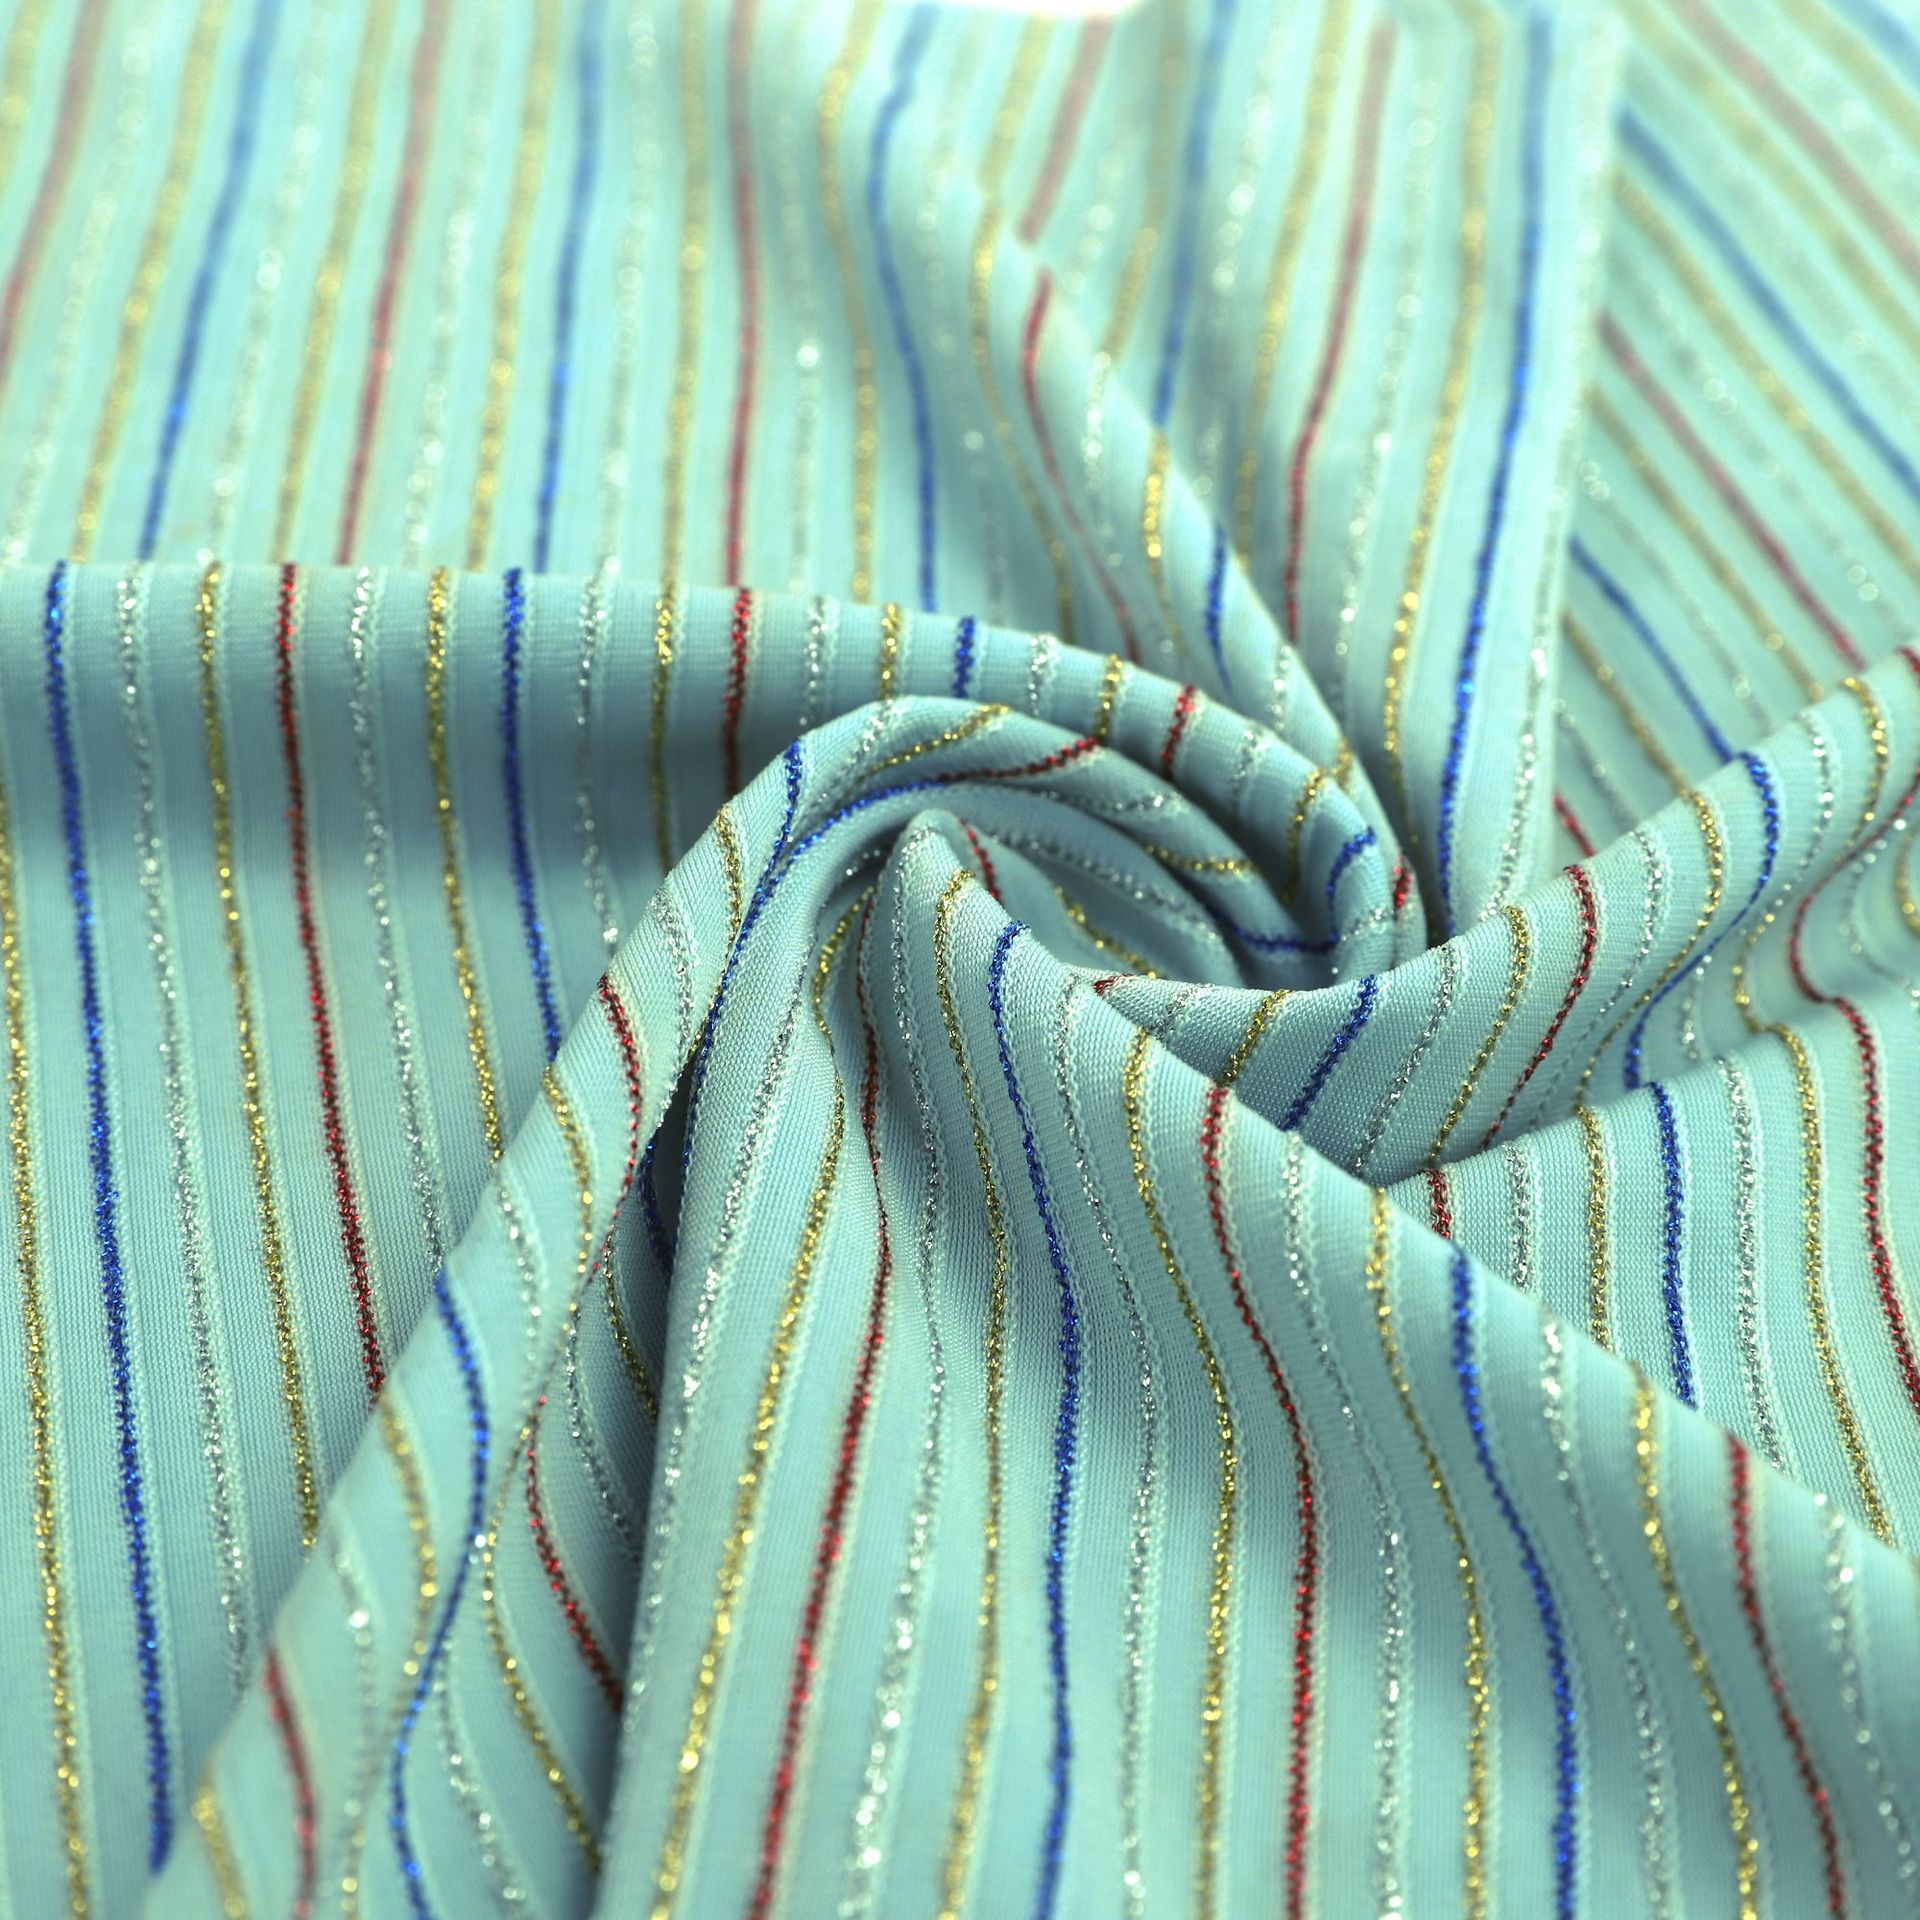 Soft And Cool Striped Gold-Line Chiffon Fabric Dress Fabric